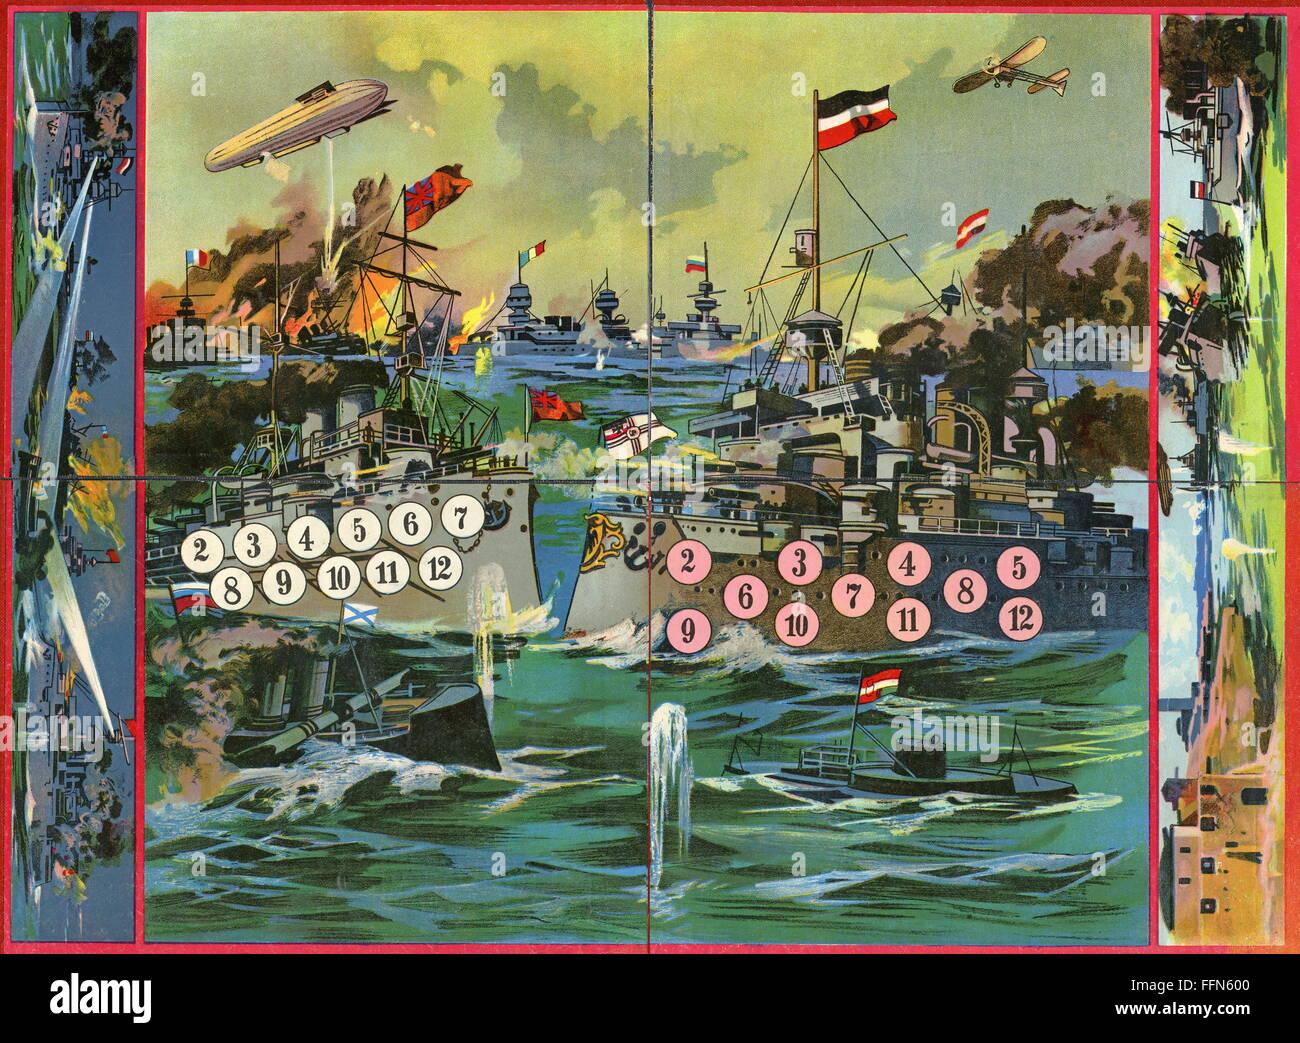 Reichskriegsflagge Imagenes De Stock Reichskriegsflagge Fotos De